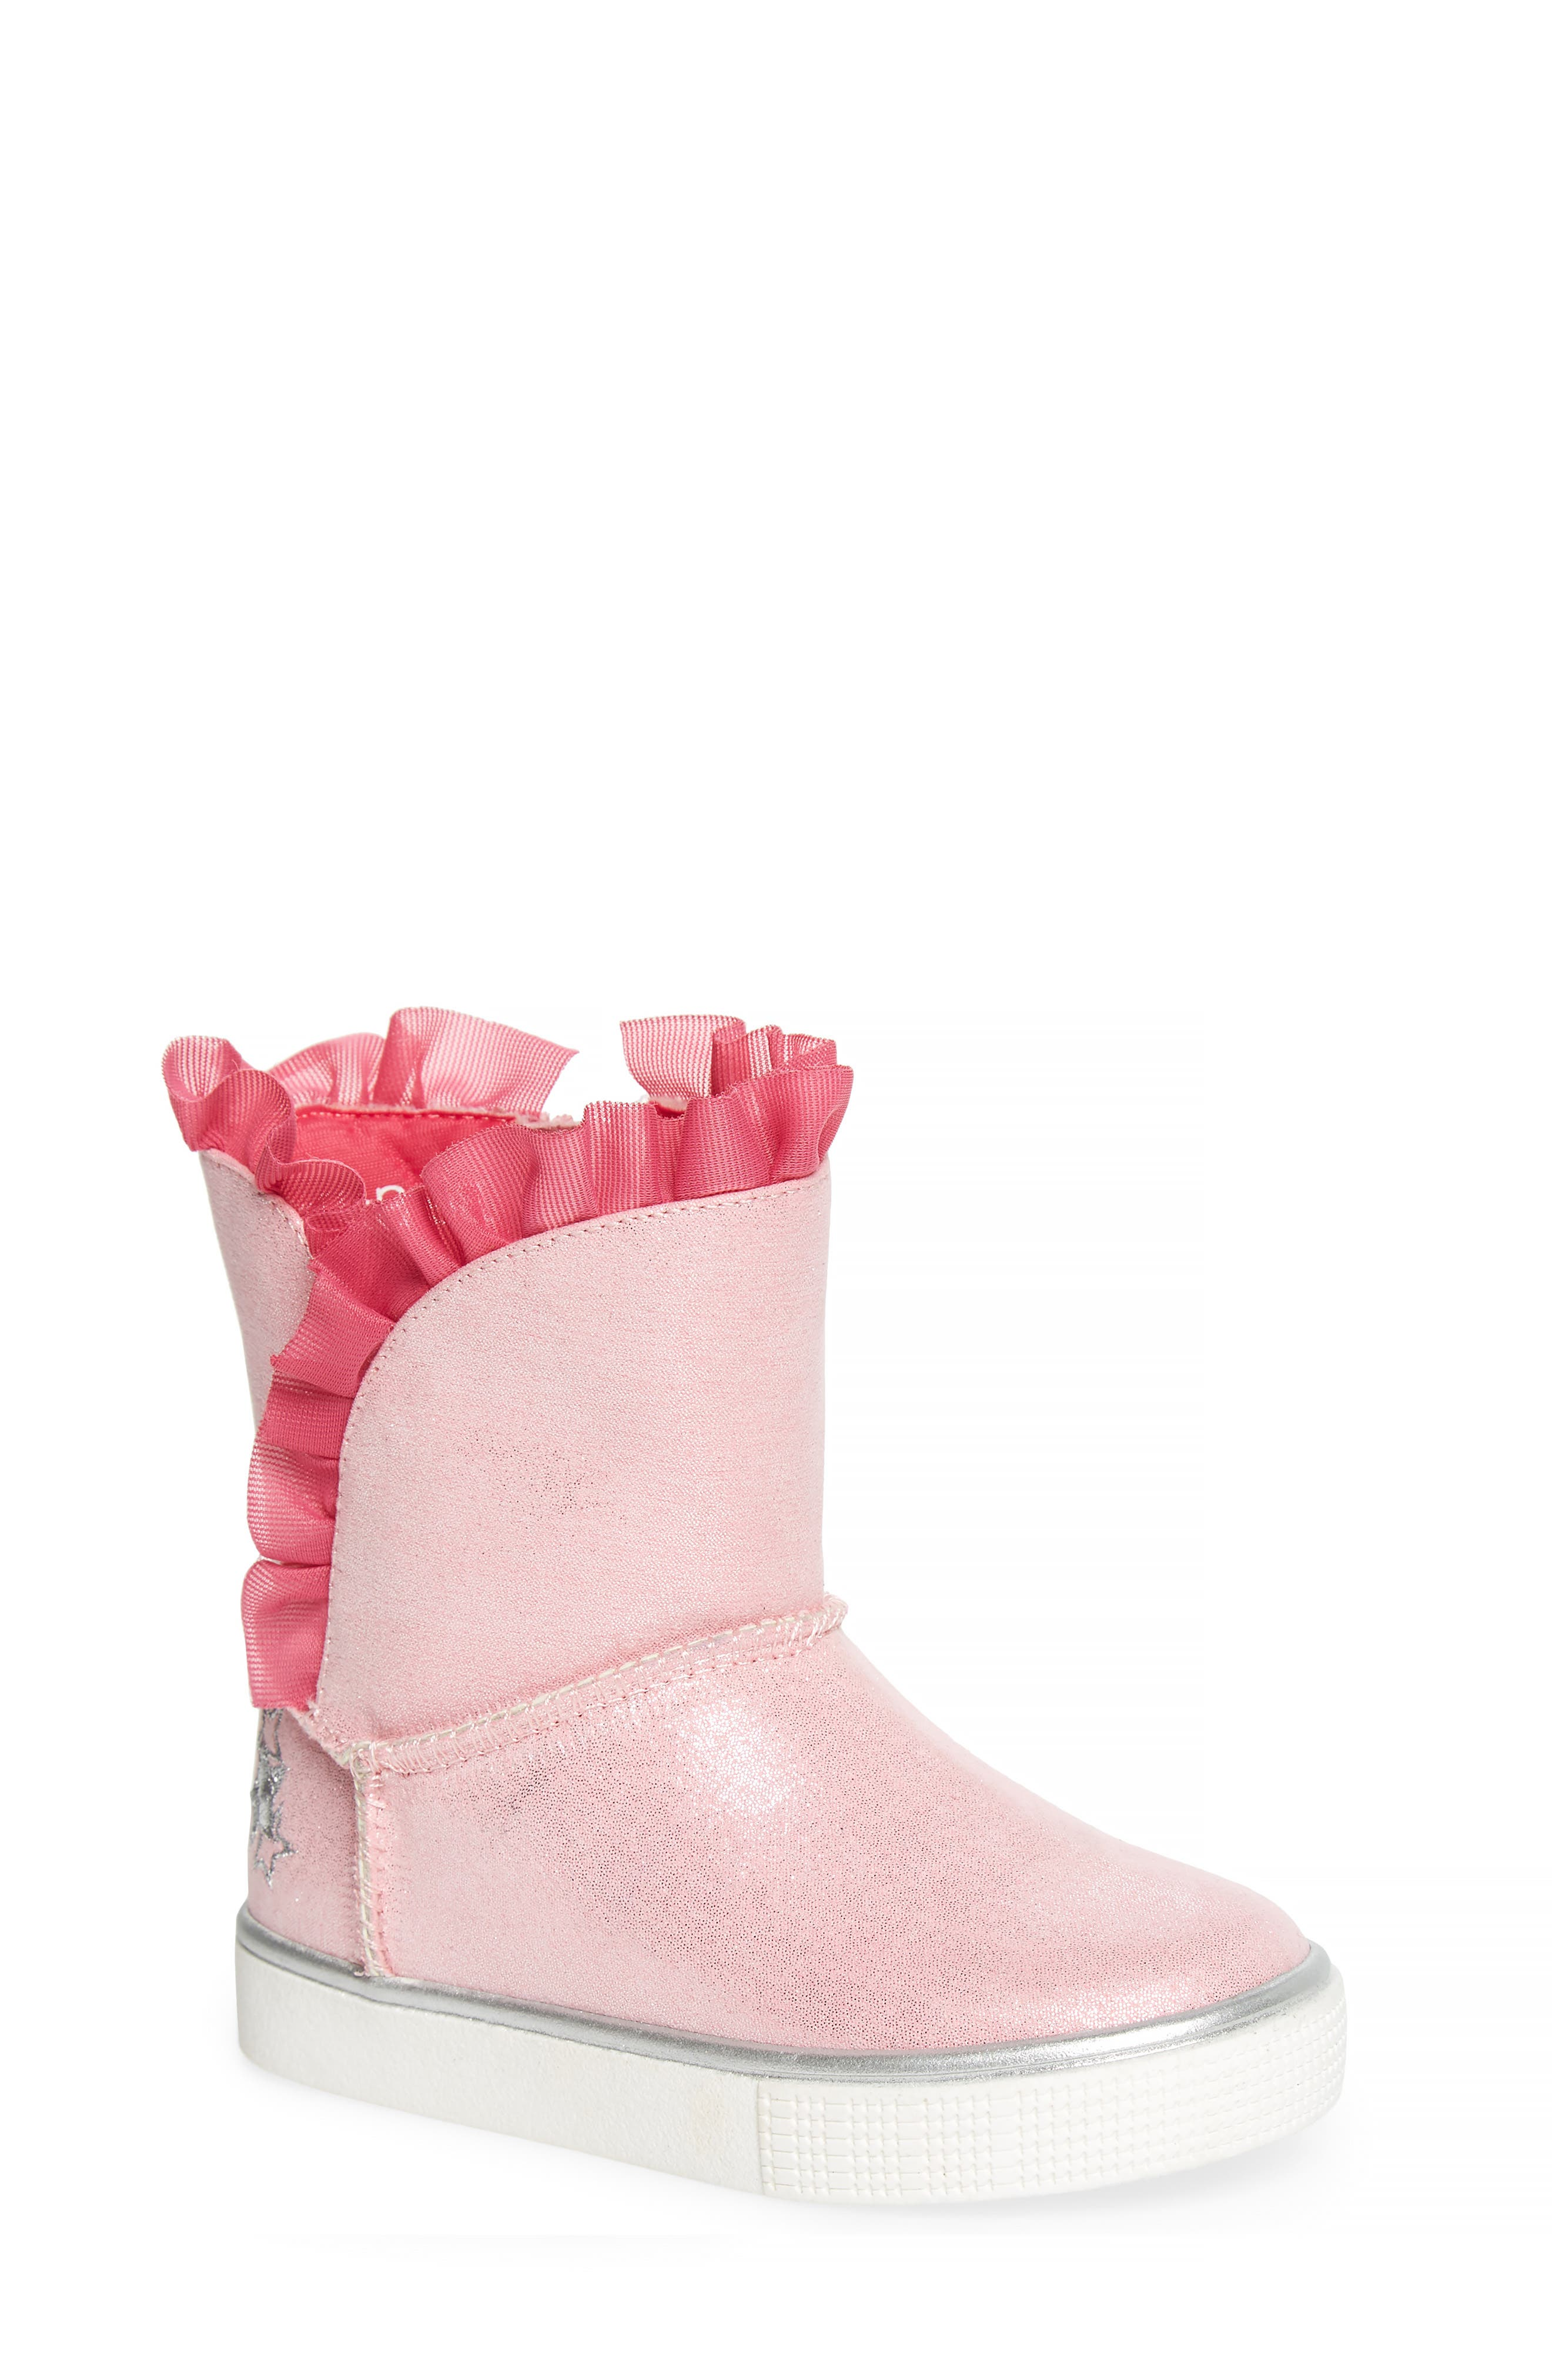 WellieWishers by American Girl Emerson Tulle Sneaker Boot (Walker, Toddler, Little Kid & Big Kid)